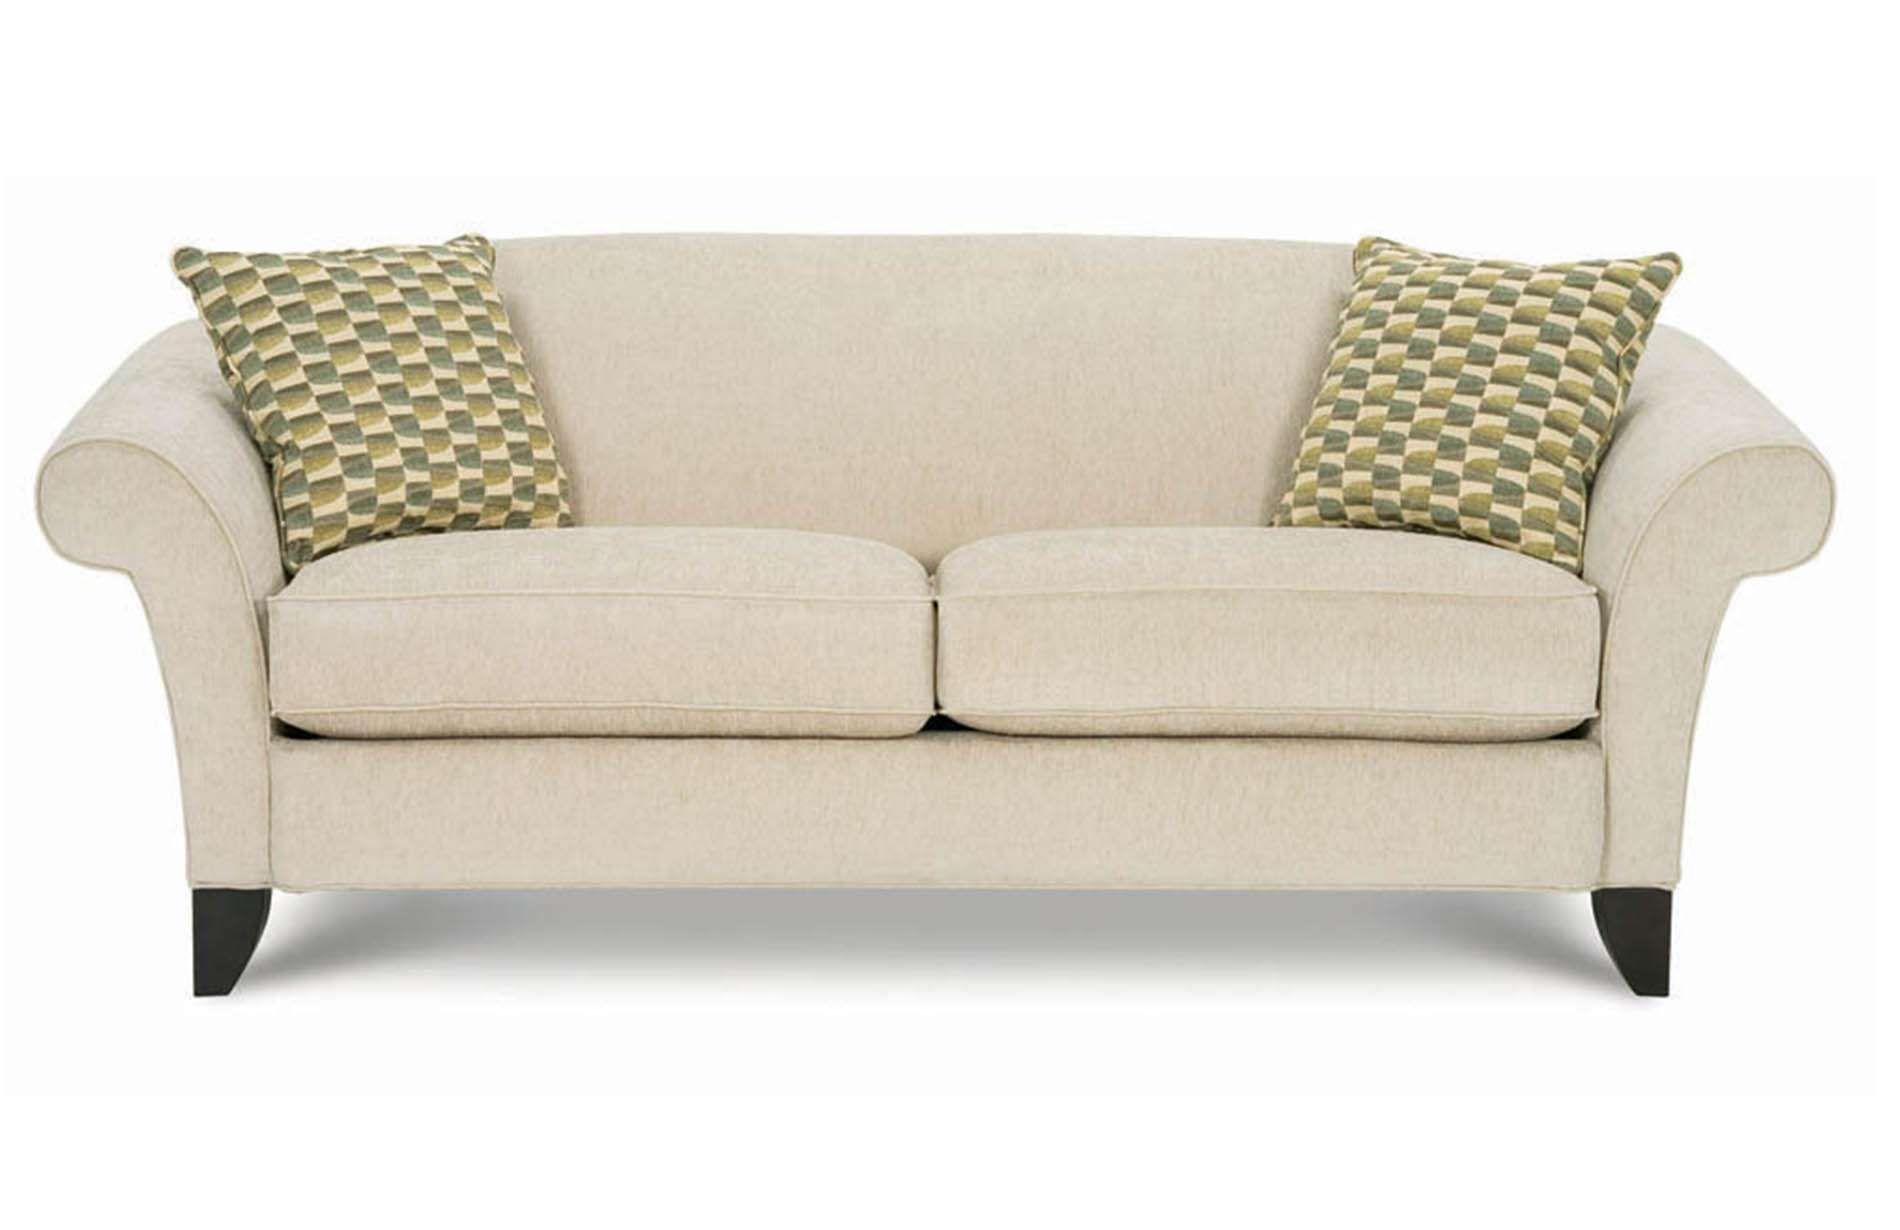 Notting Hill Sofa